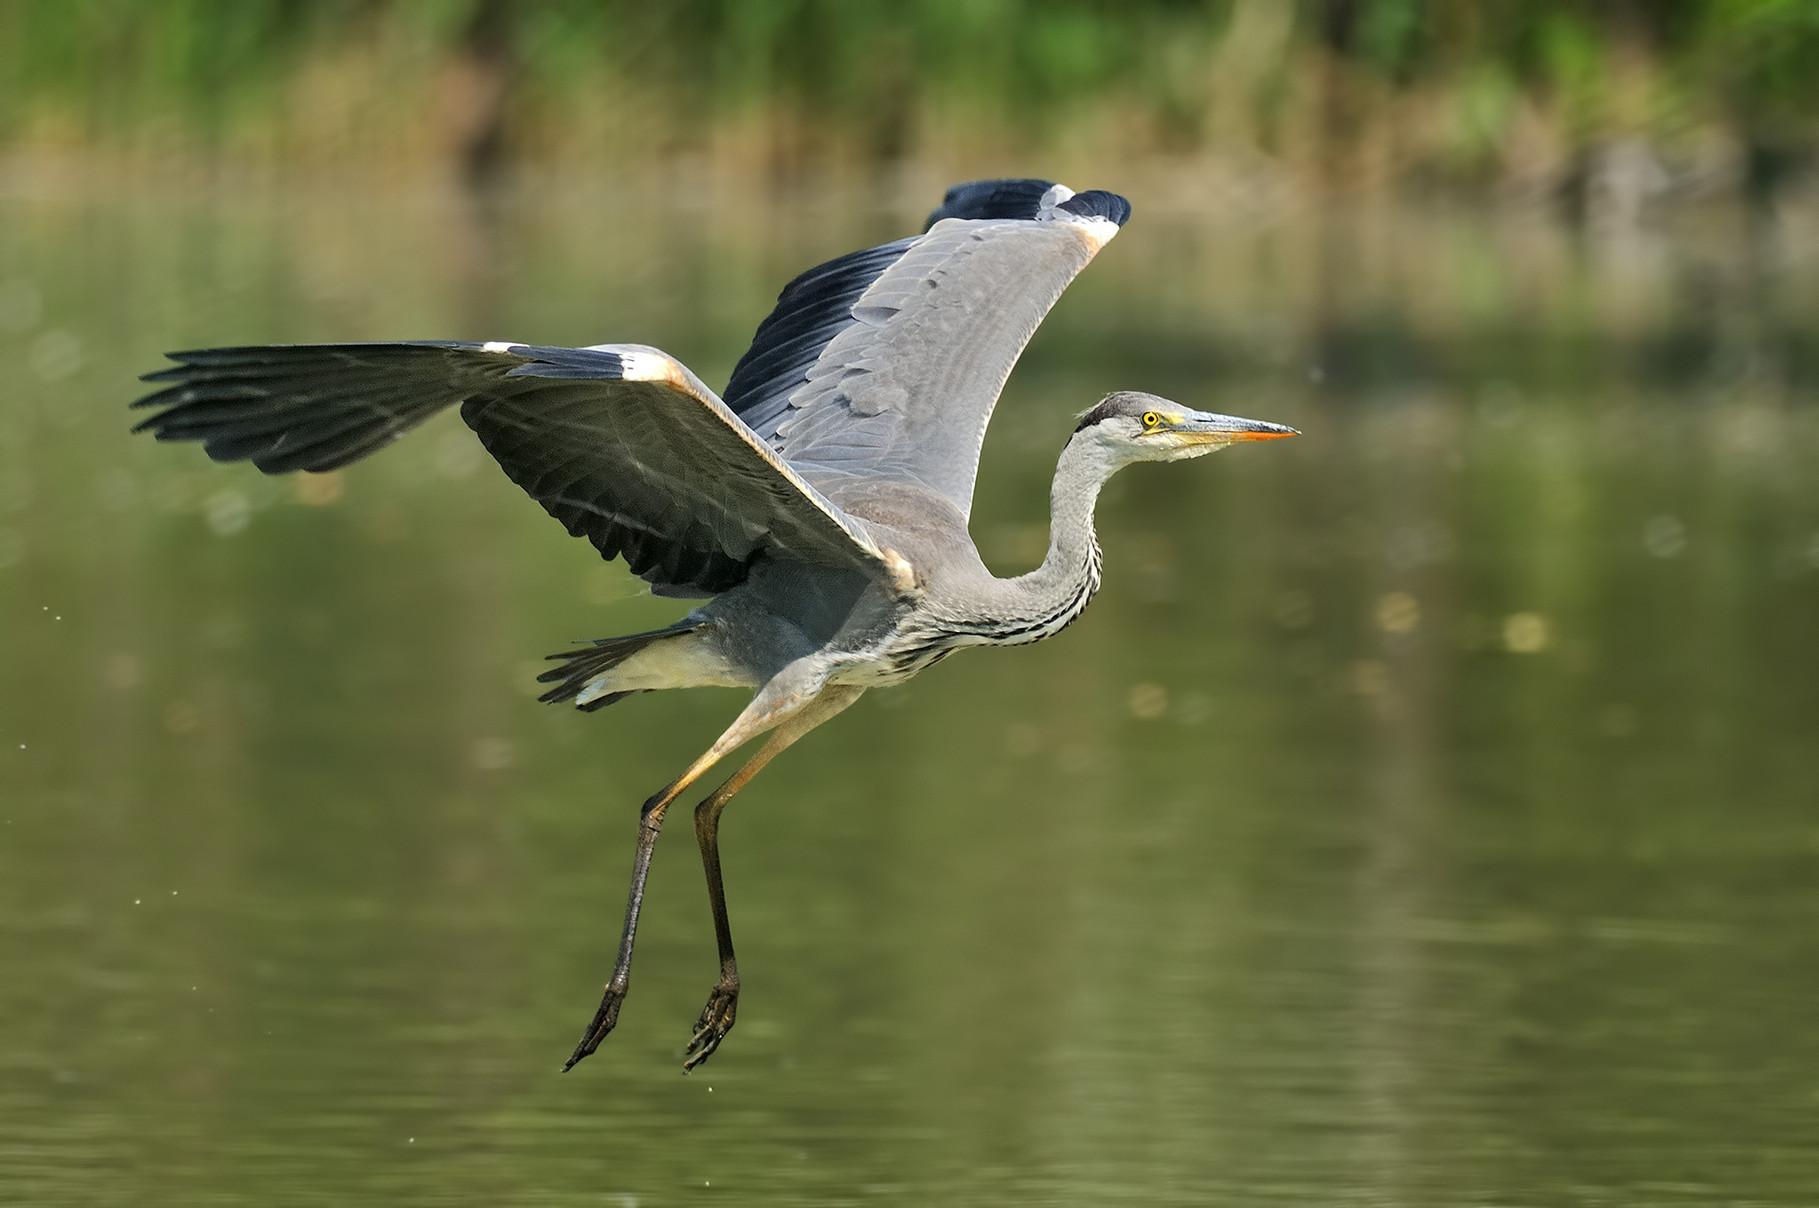 Airone cenerini - Grey heron